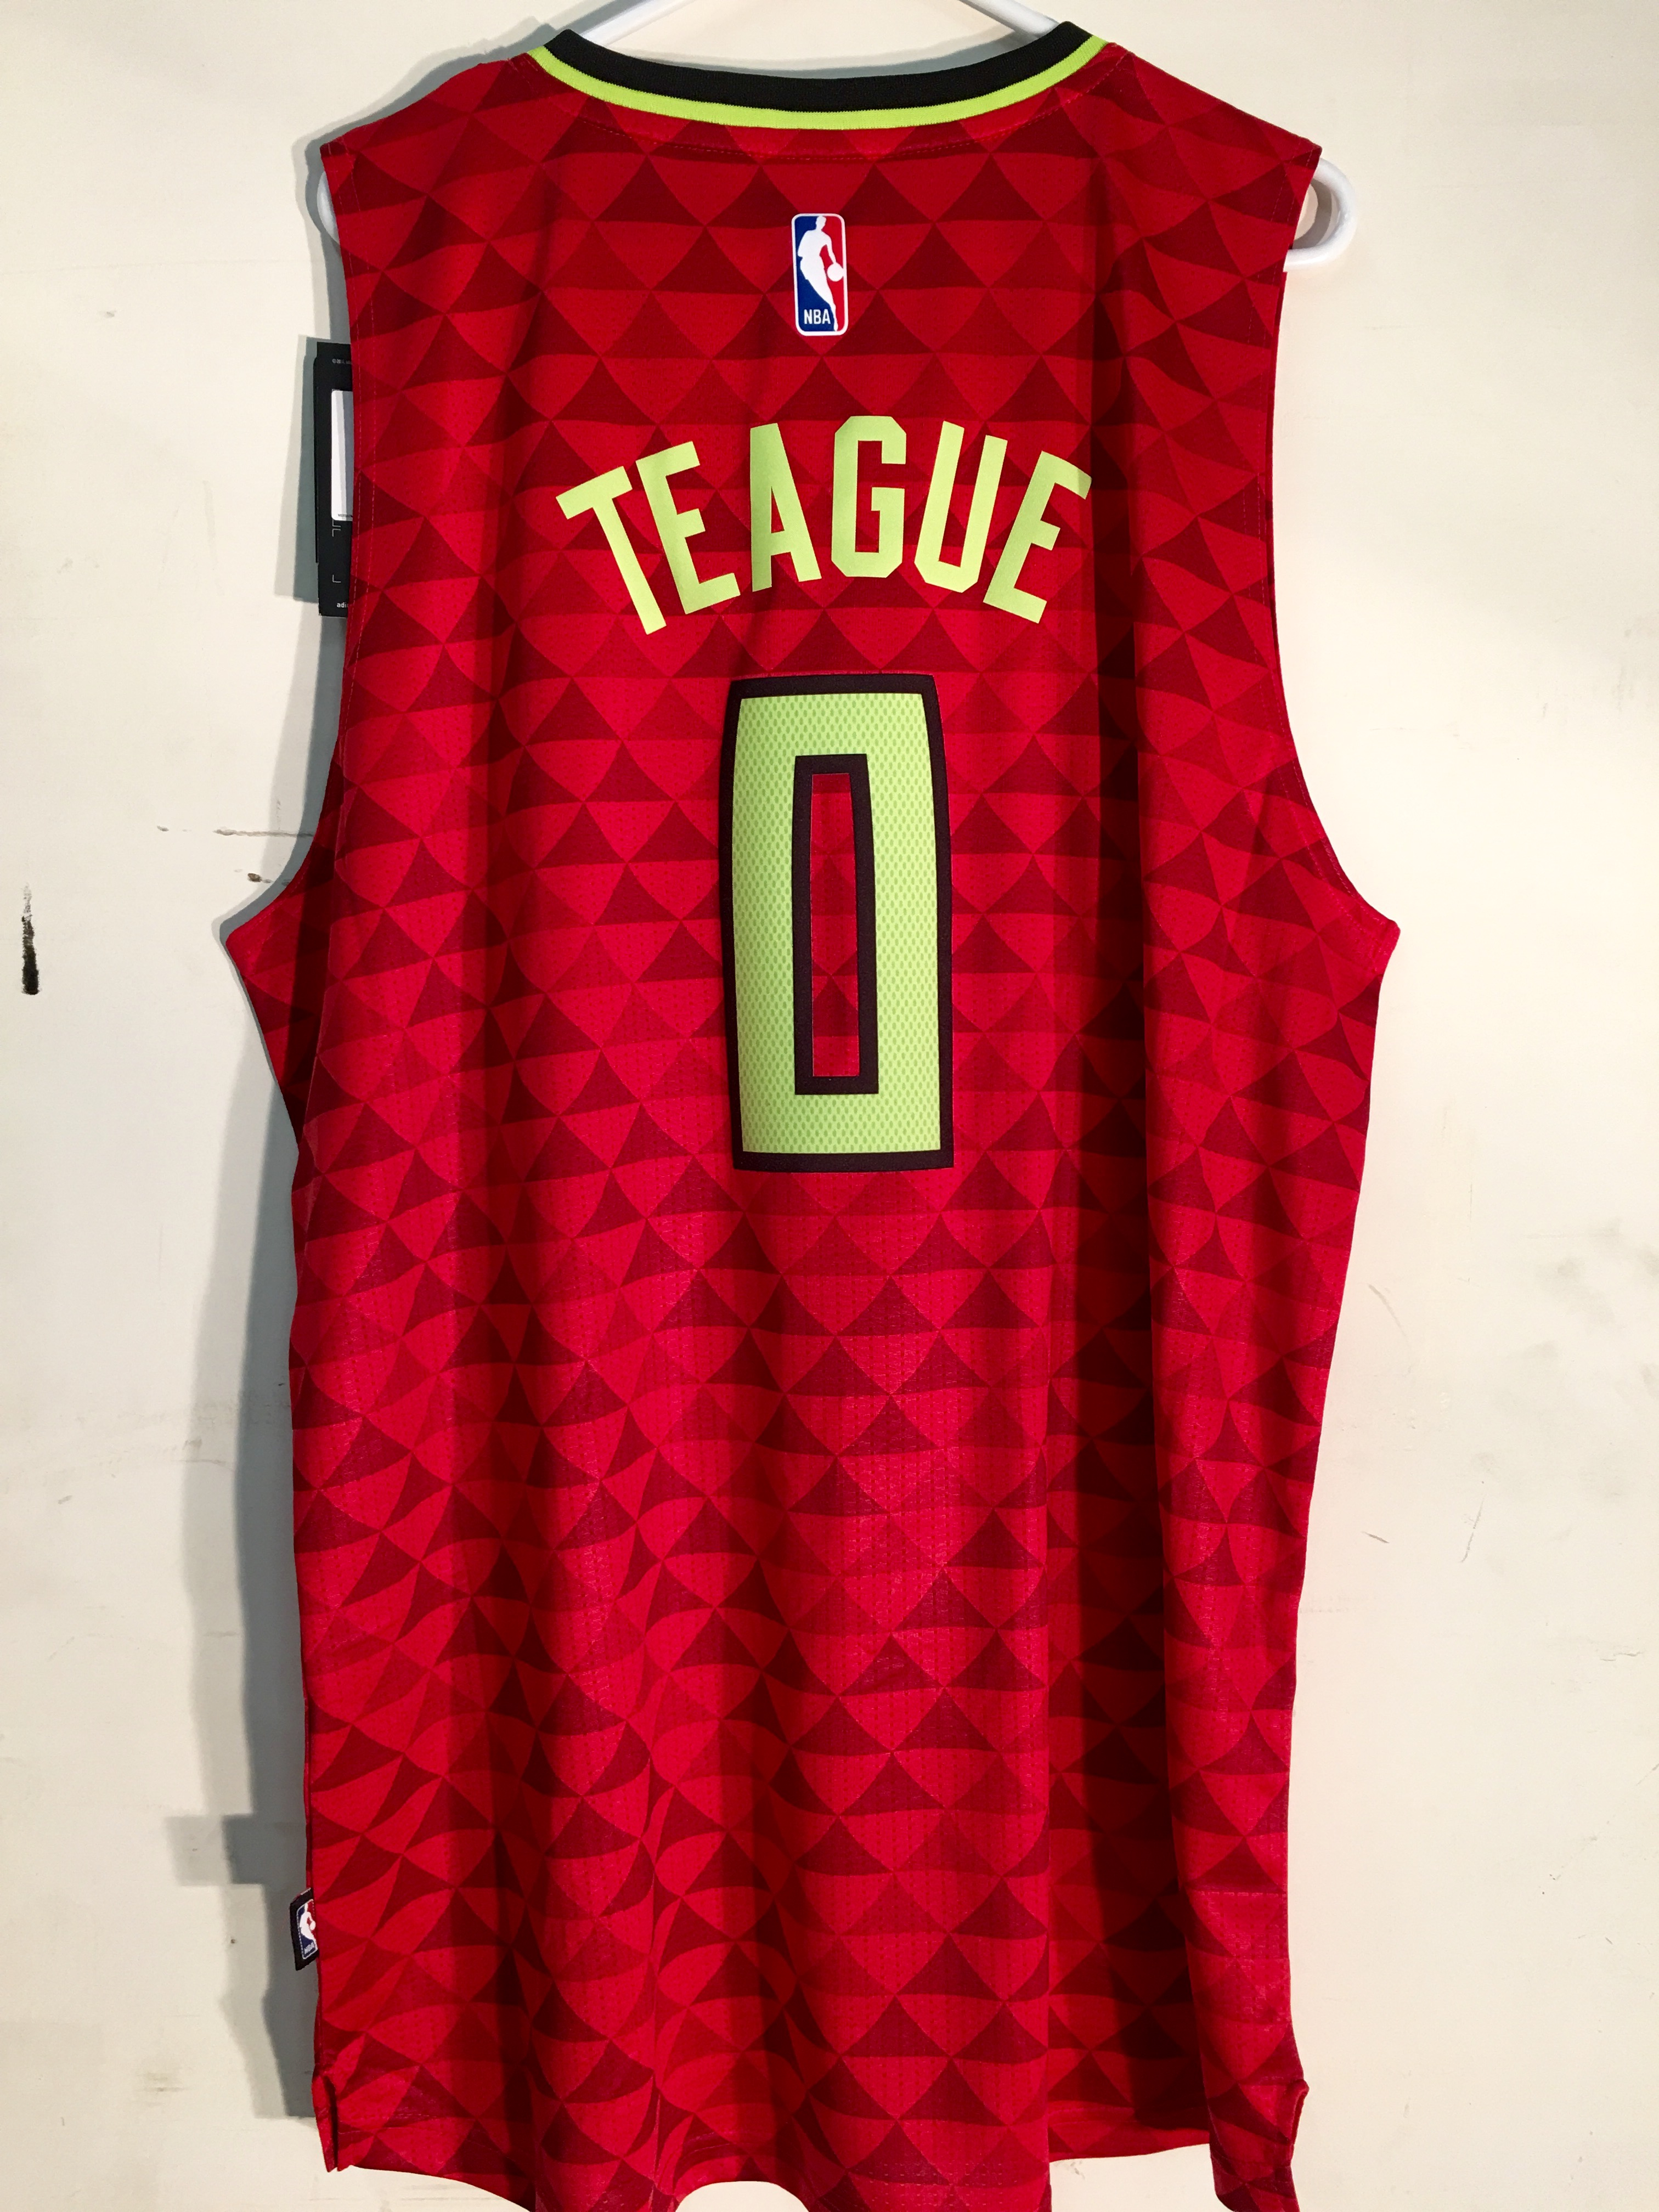 Details about Adidas Swingman 2015 16 NBA Jersey Atlanta Hawks Jeff Teague Red Alt sz M